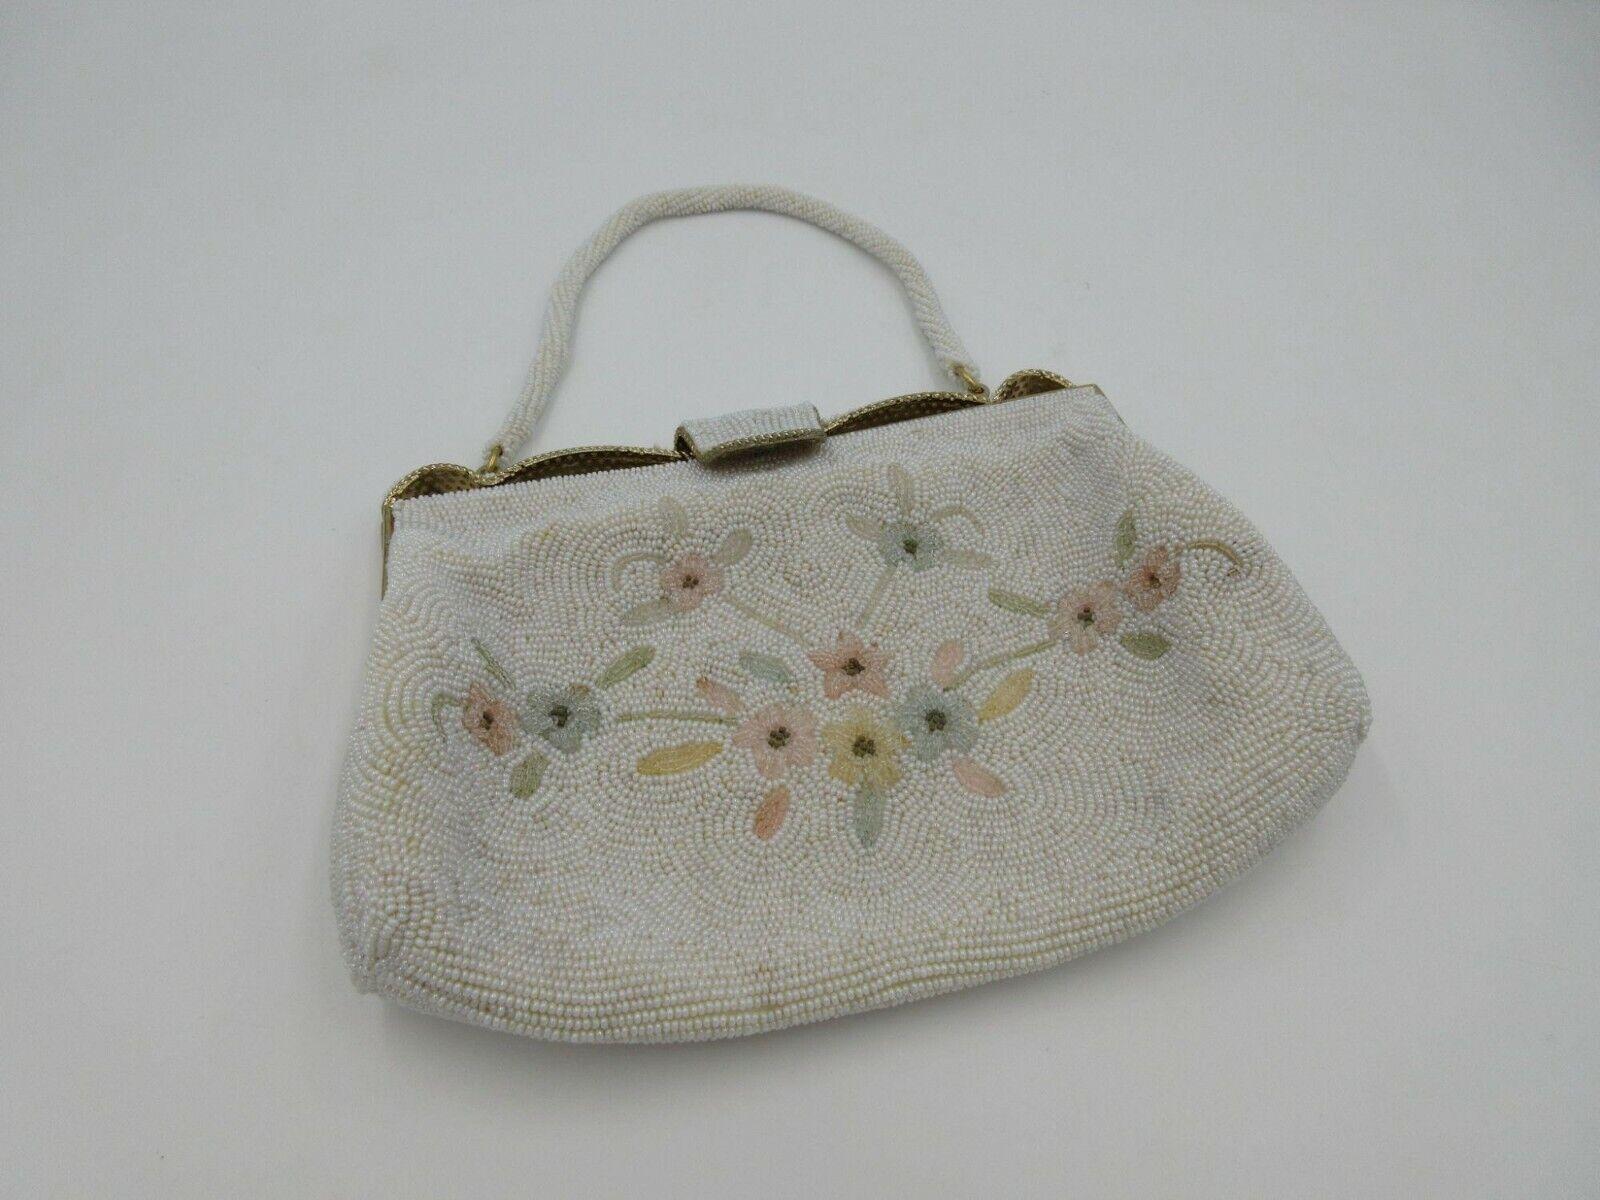 Vintage women's hand beaded floral handbag clutch made in Japan